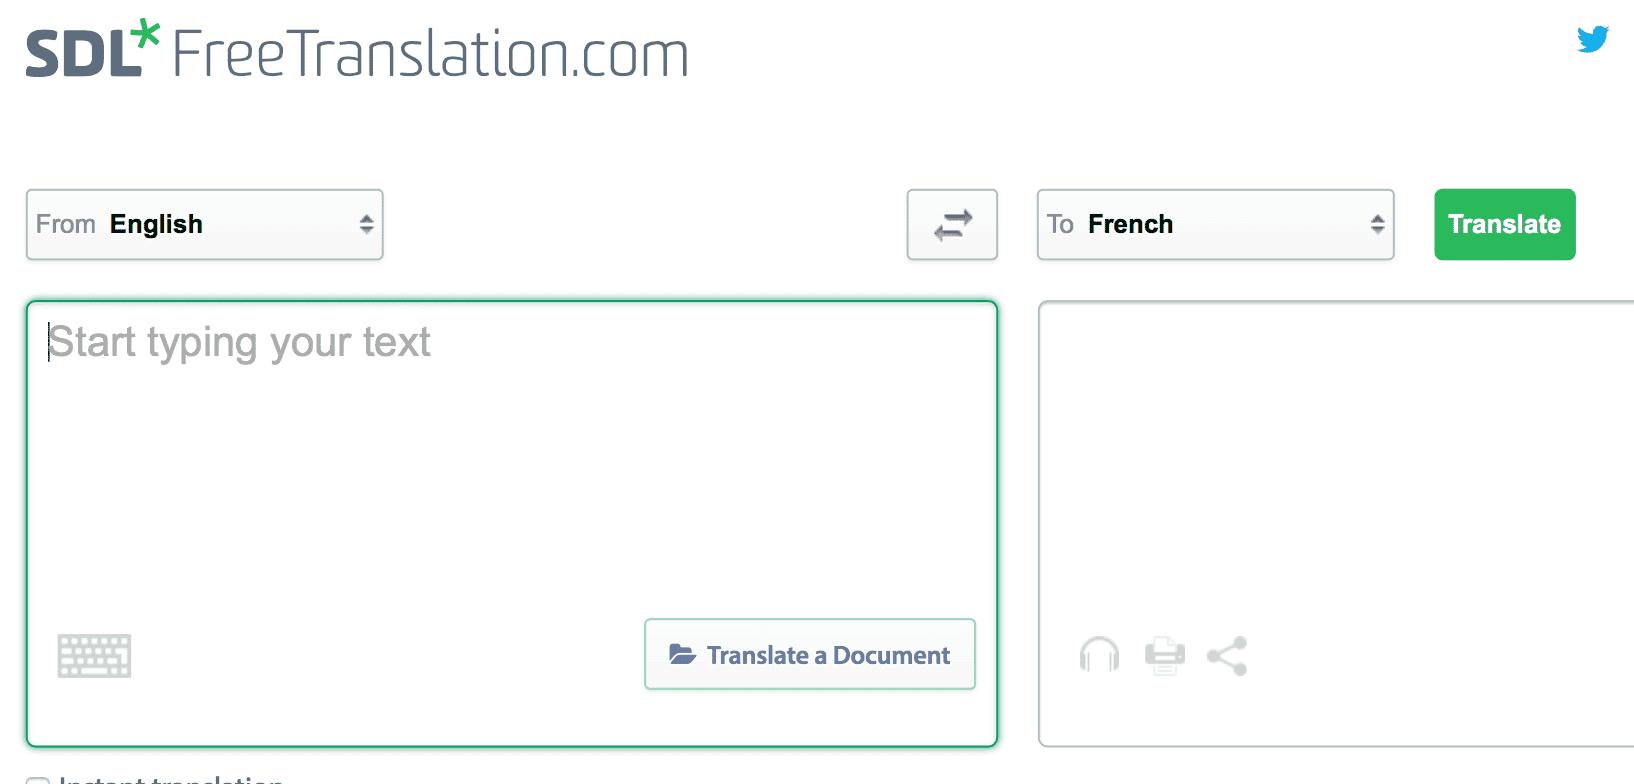 SDL Free Translation French